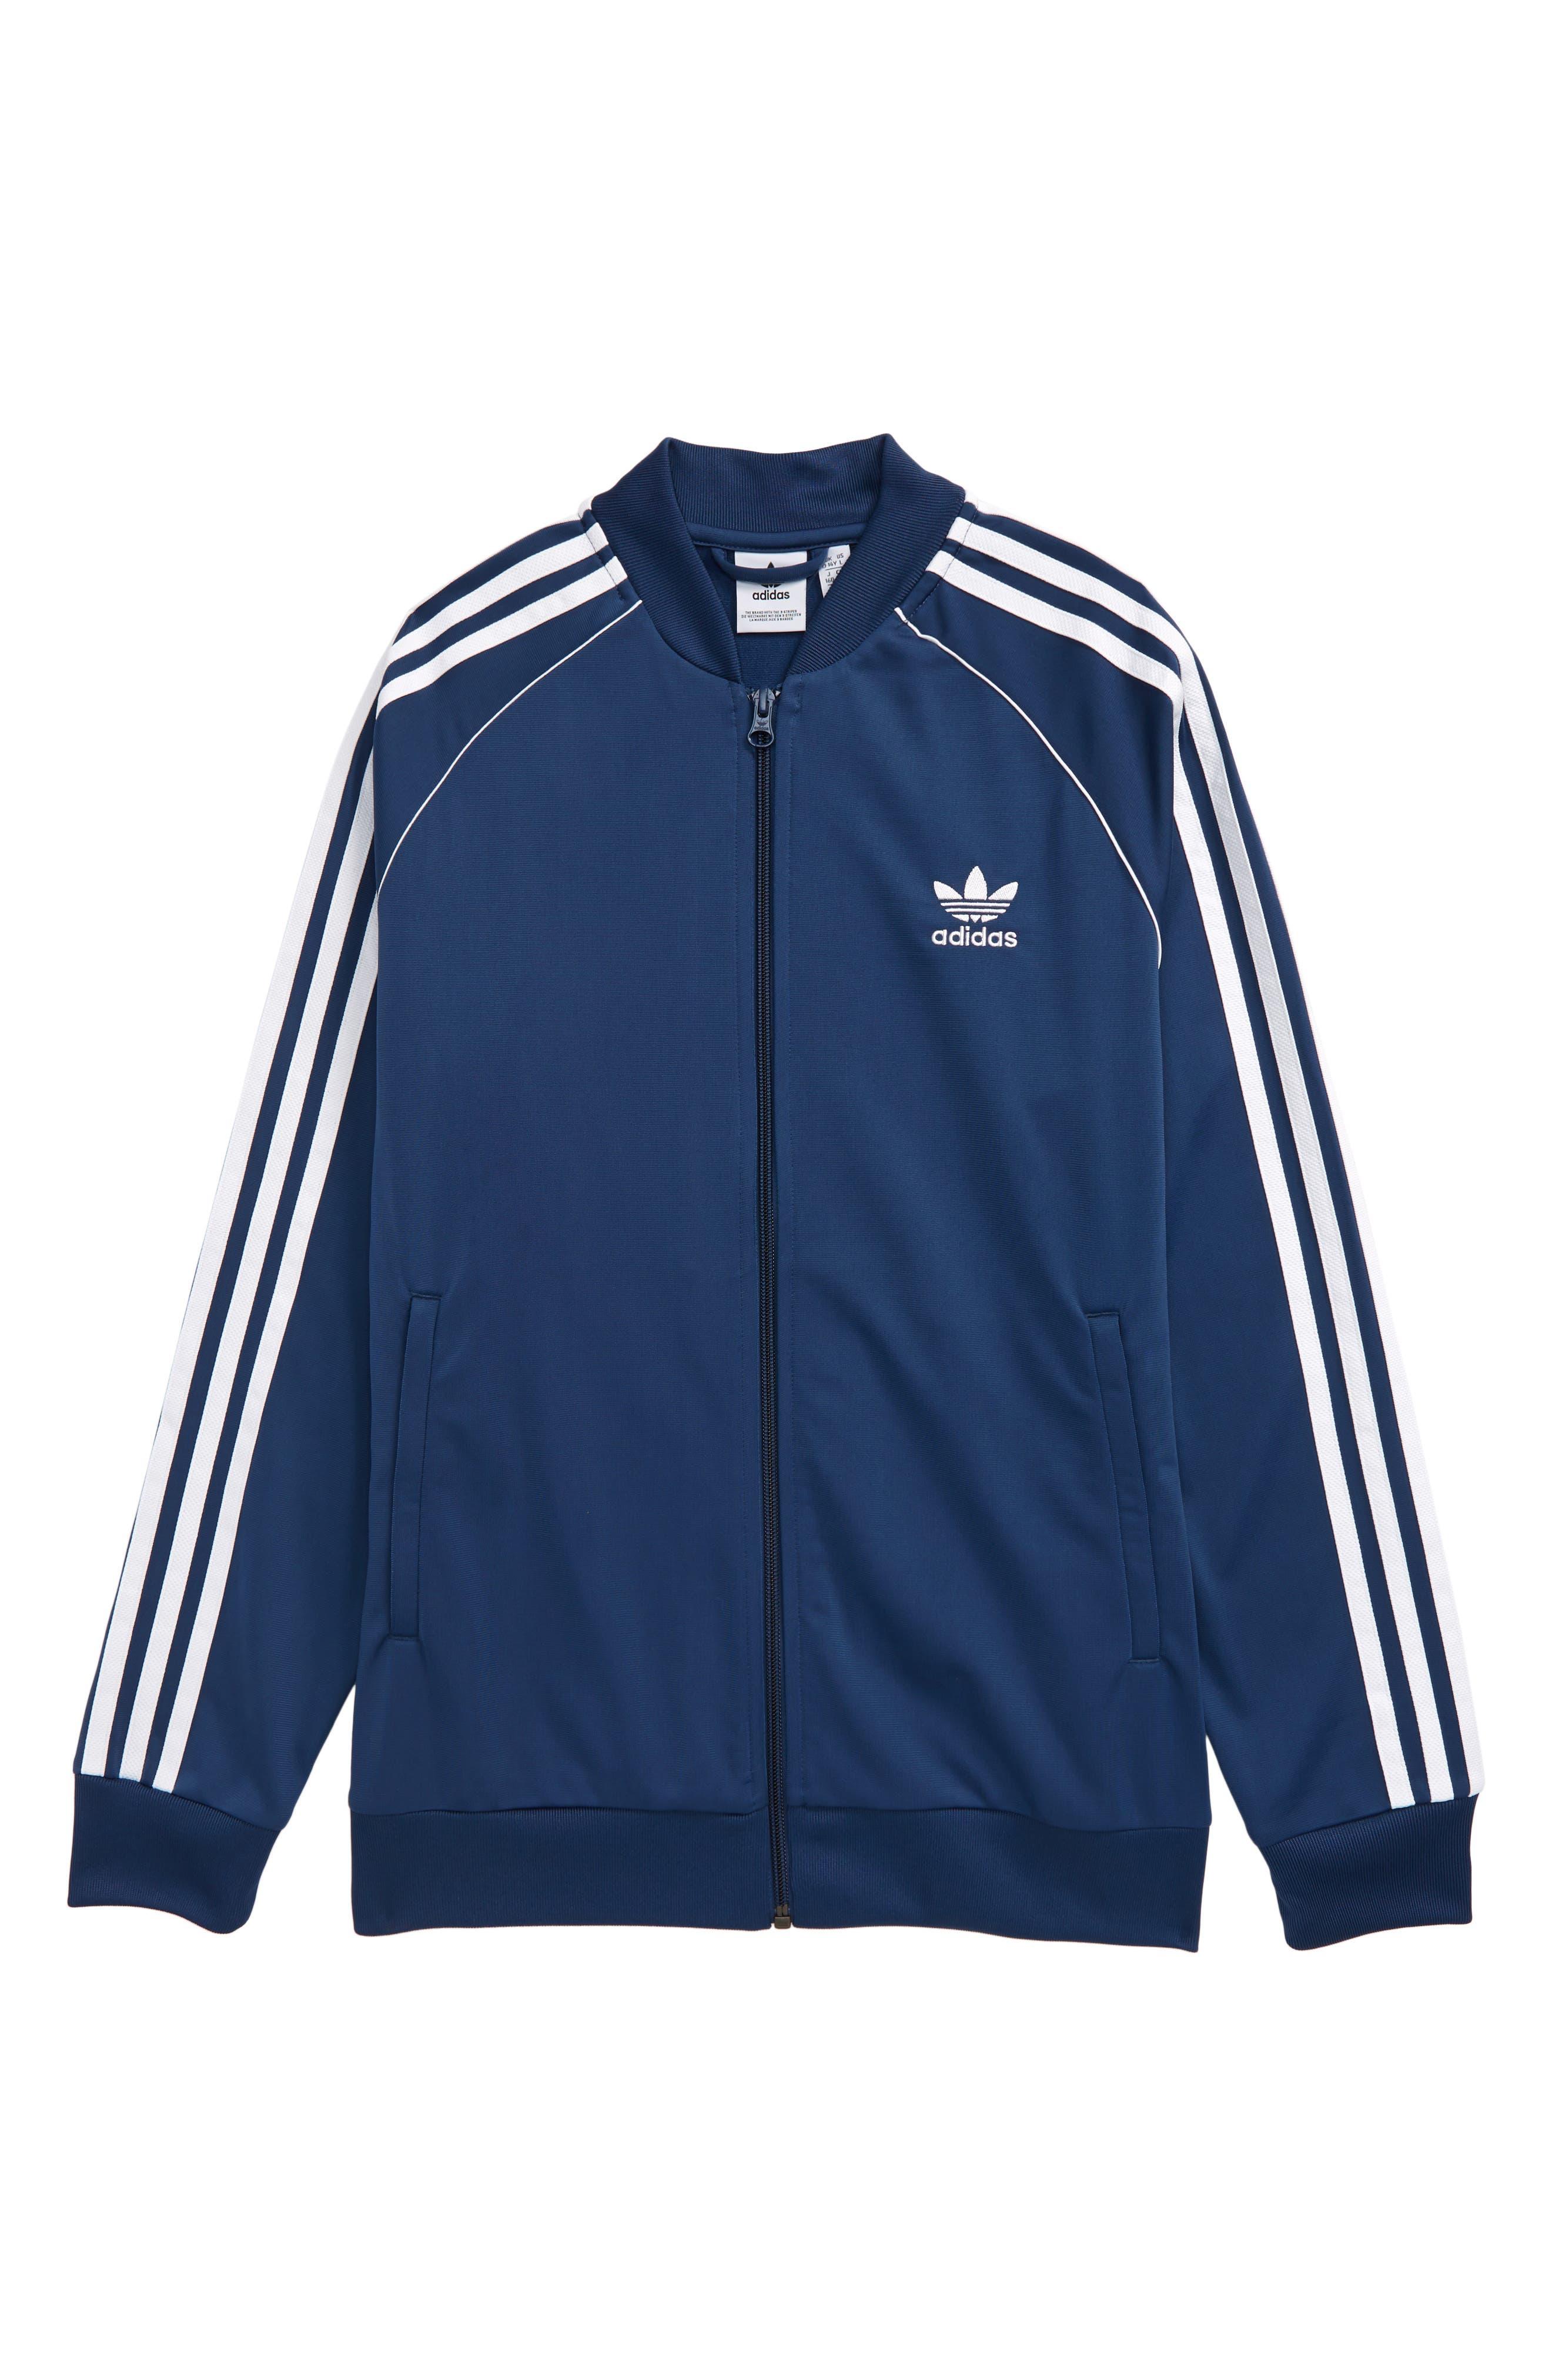 Boys' Adidas Originals Clothing: Hoodies, Shirts, Pants & T